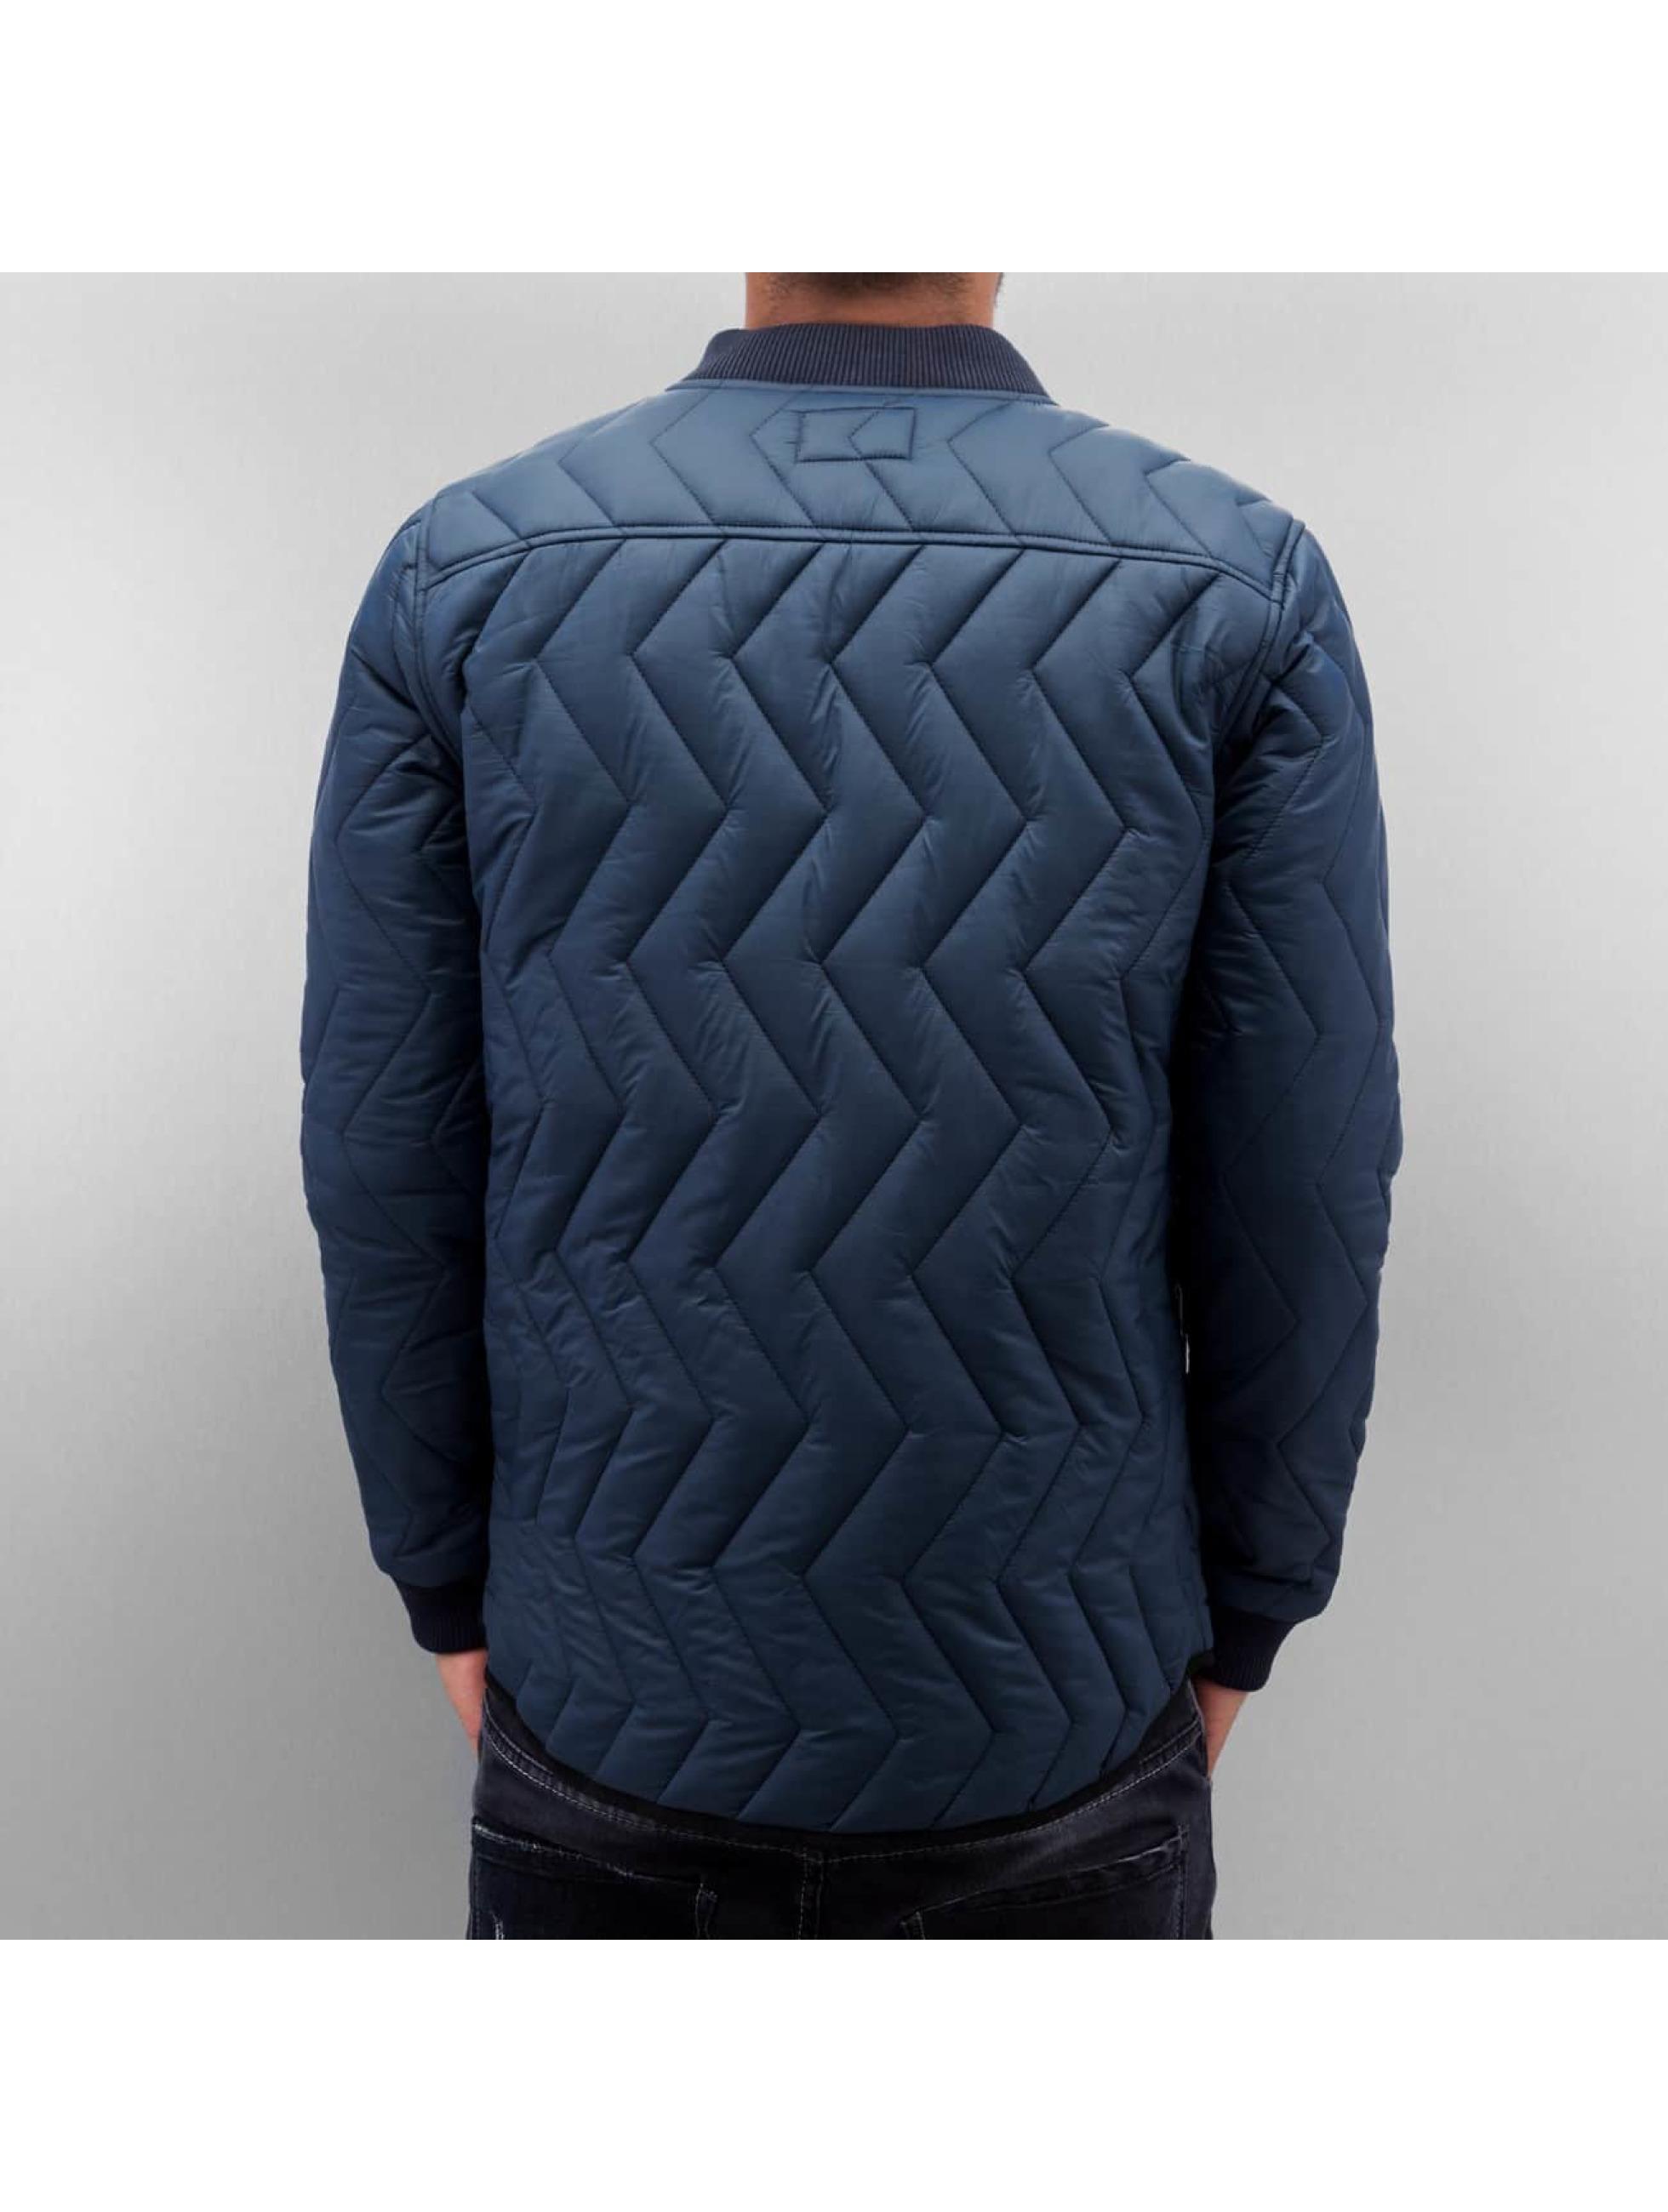 SHINE Original Winterjacke Quilted blau